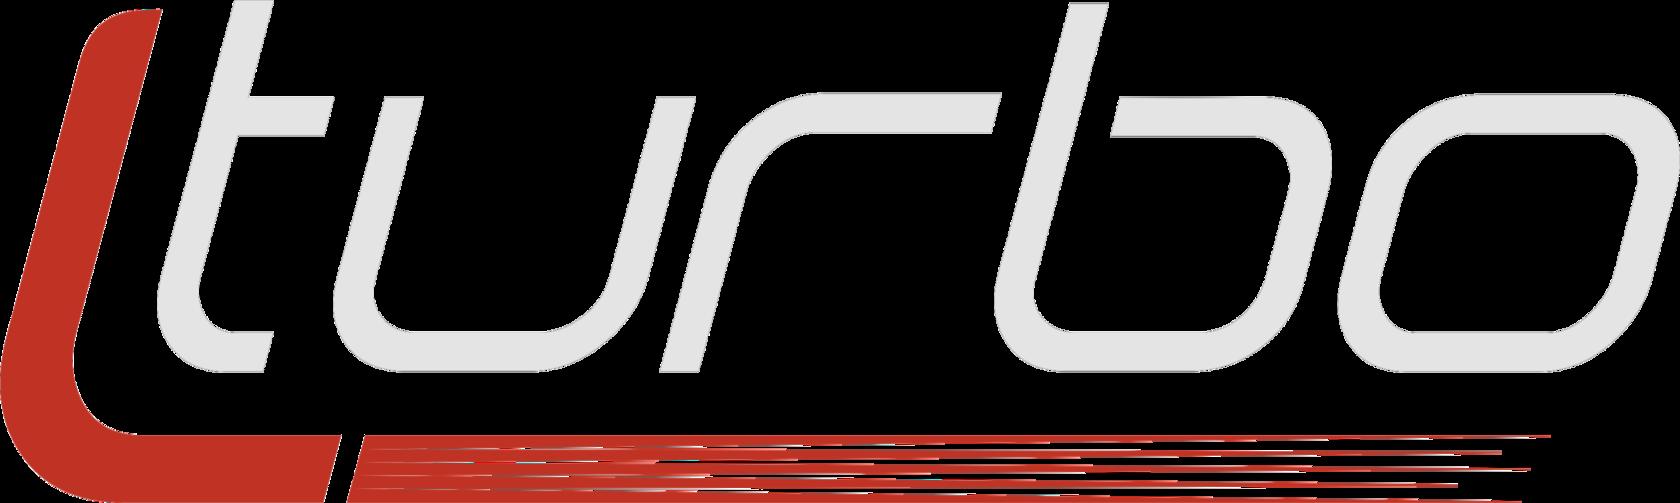 Lturbo